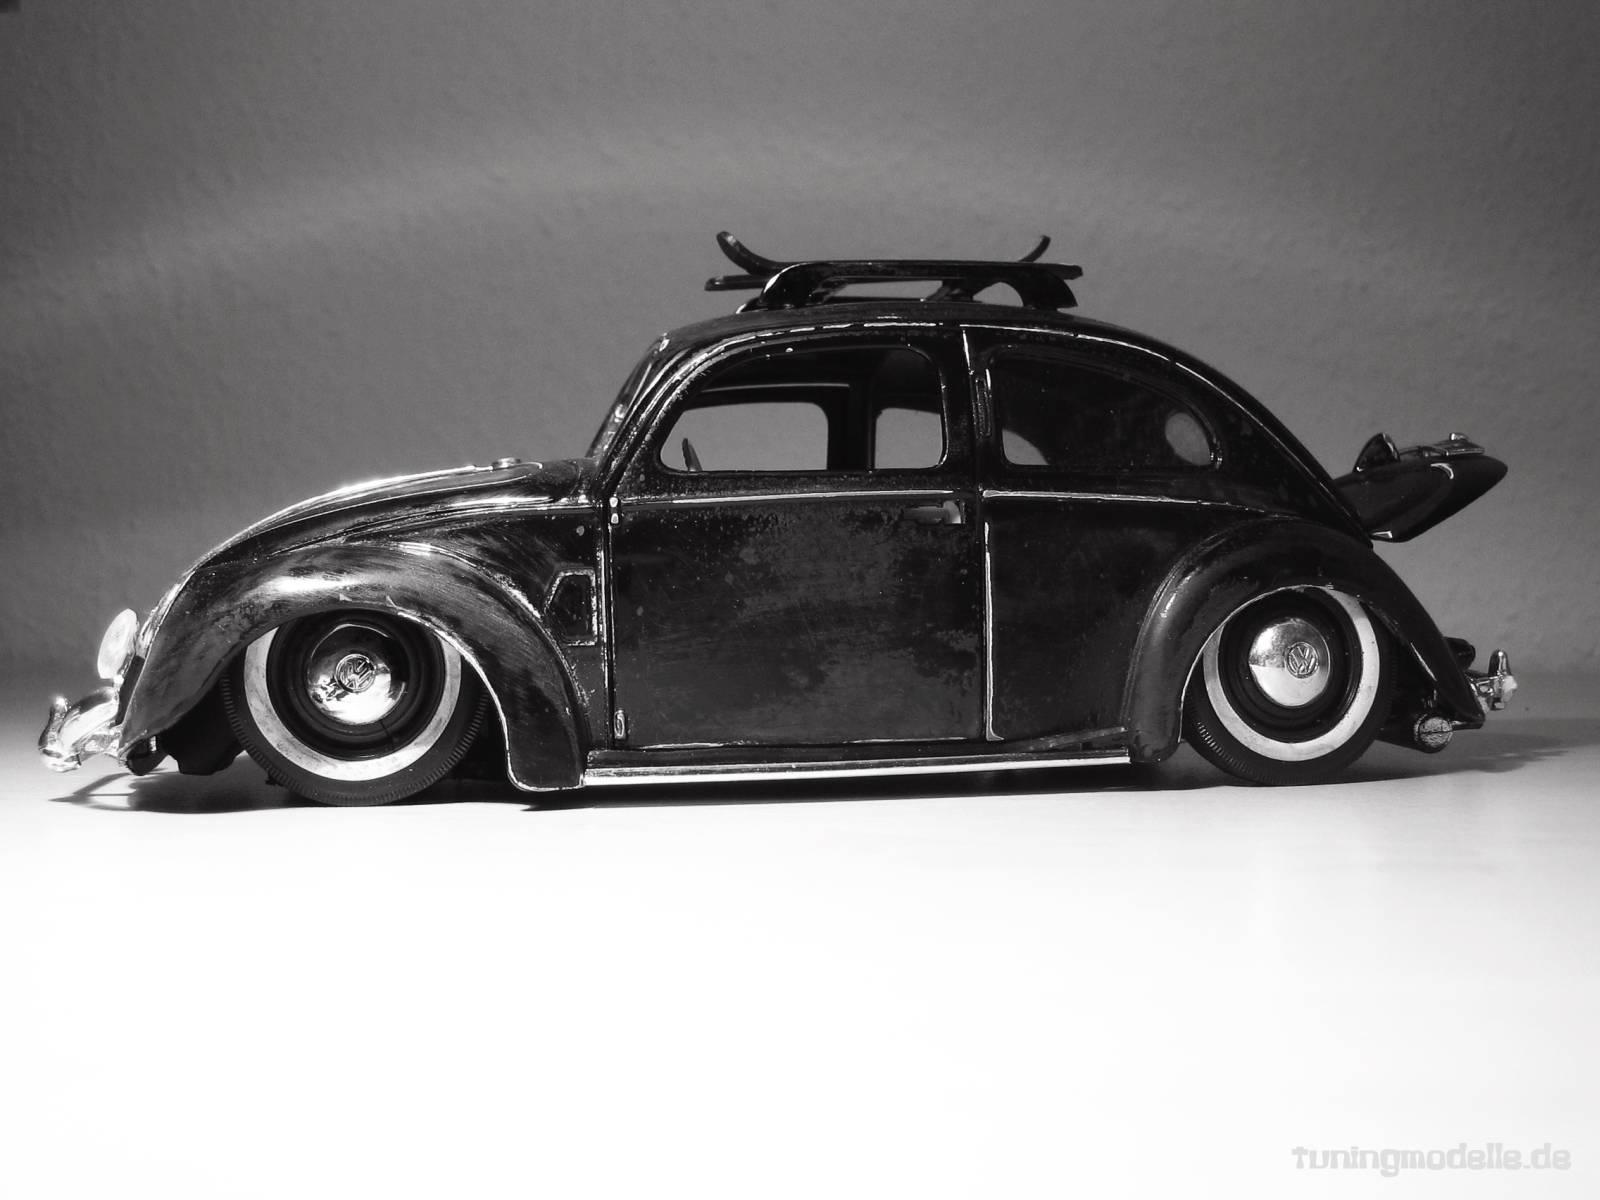 Wallpaper VW 118 auf Tuningmodellede 1600x1200